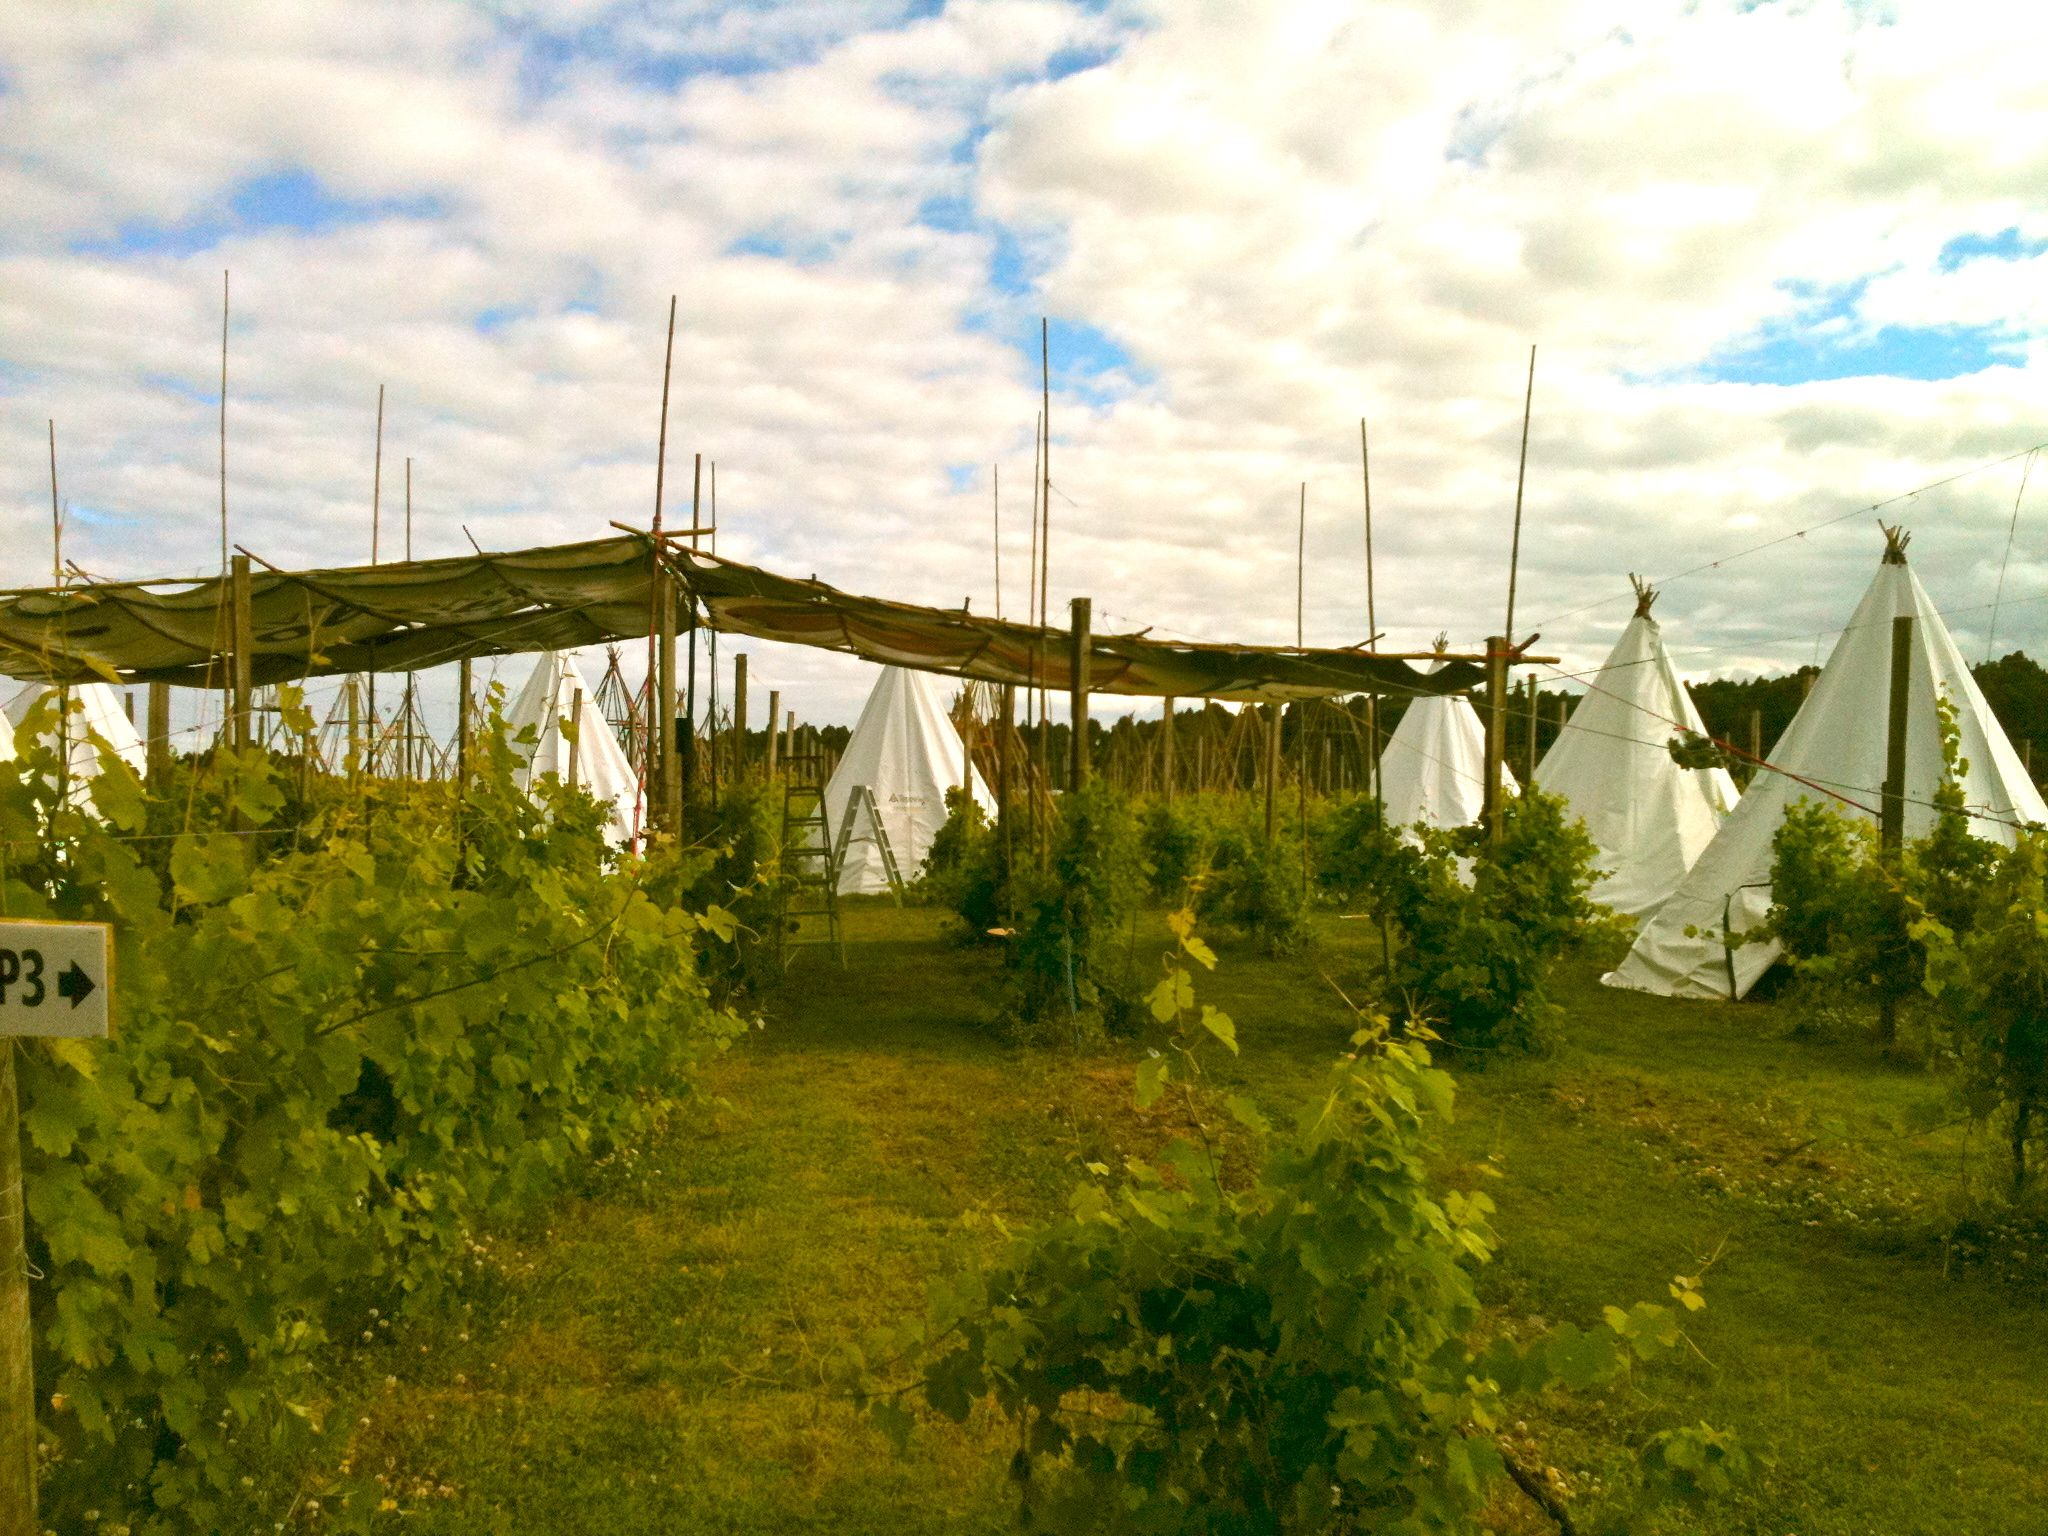 Tepee Life Village under construction, Rhythm and Vines Festival, Gisborne, NZ